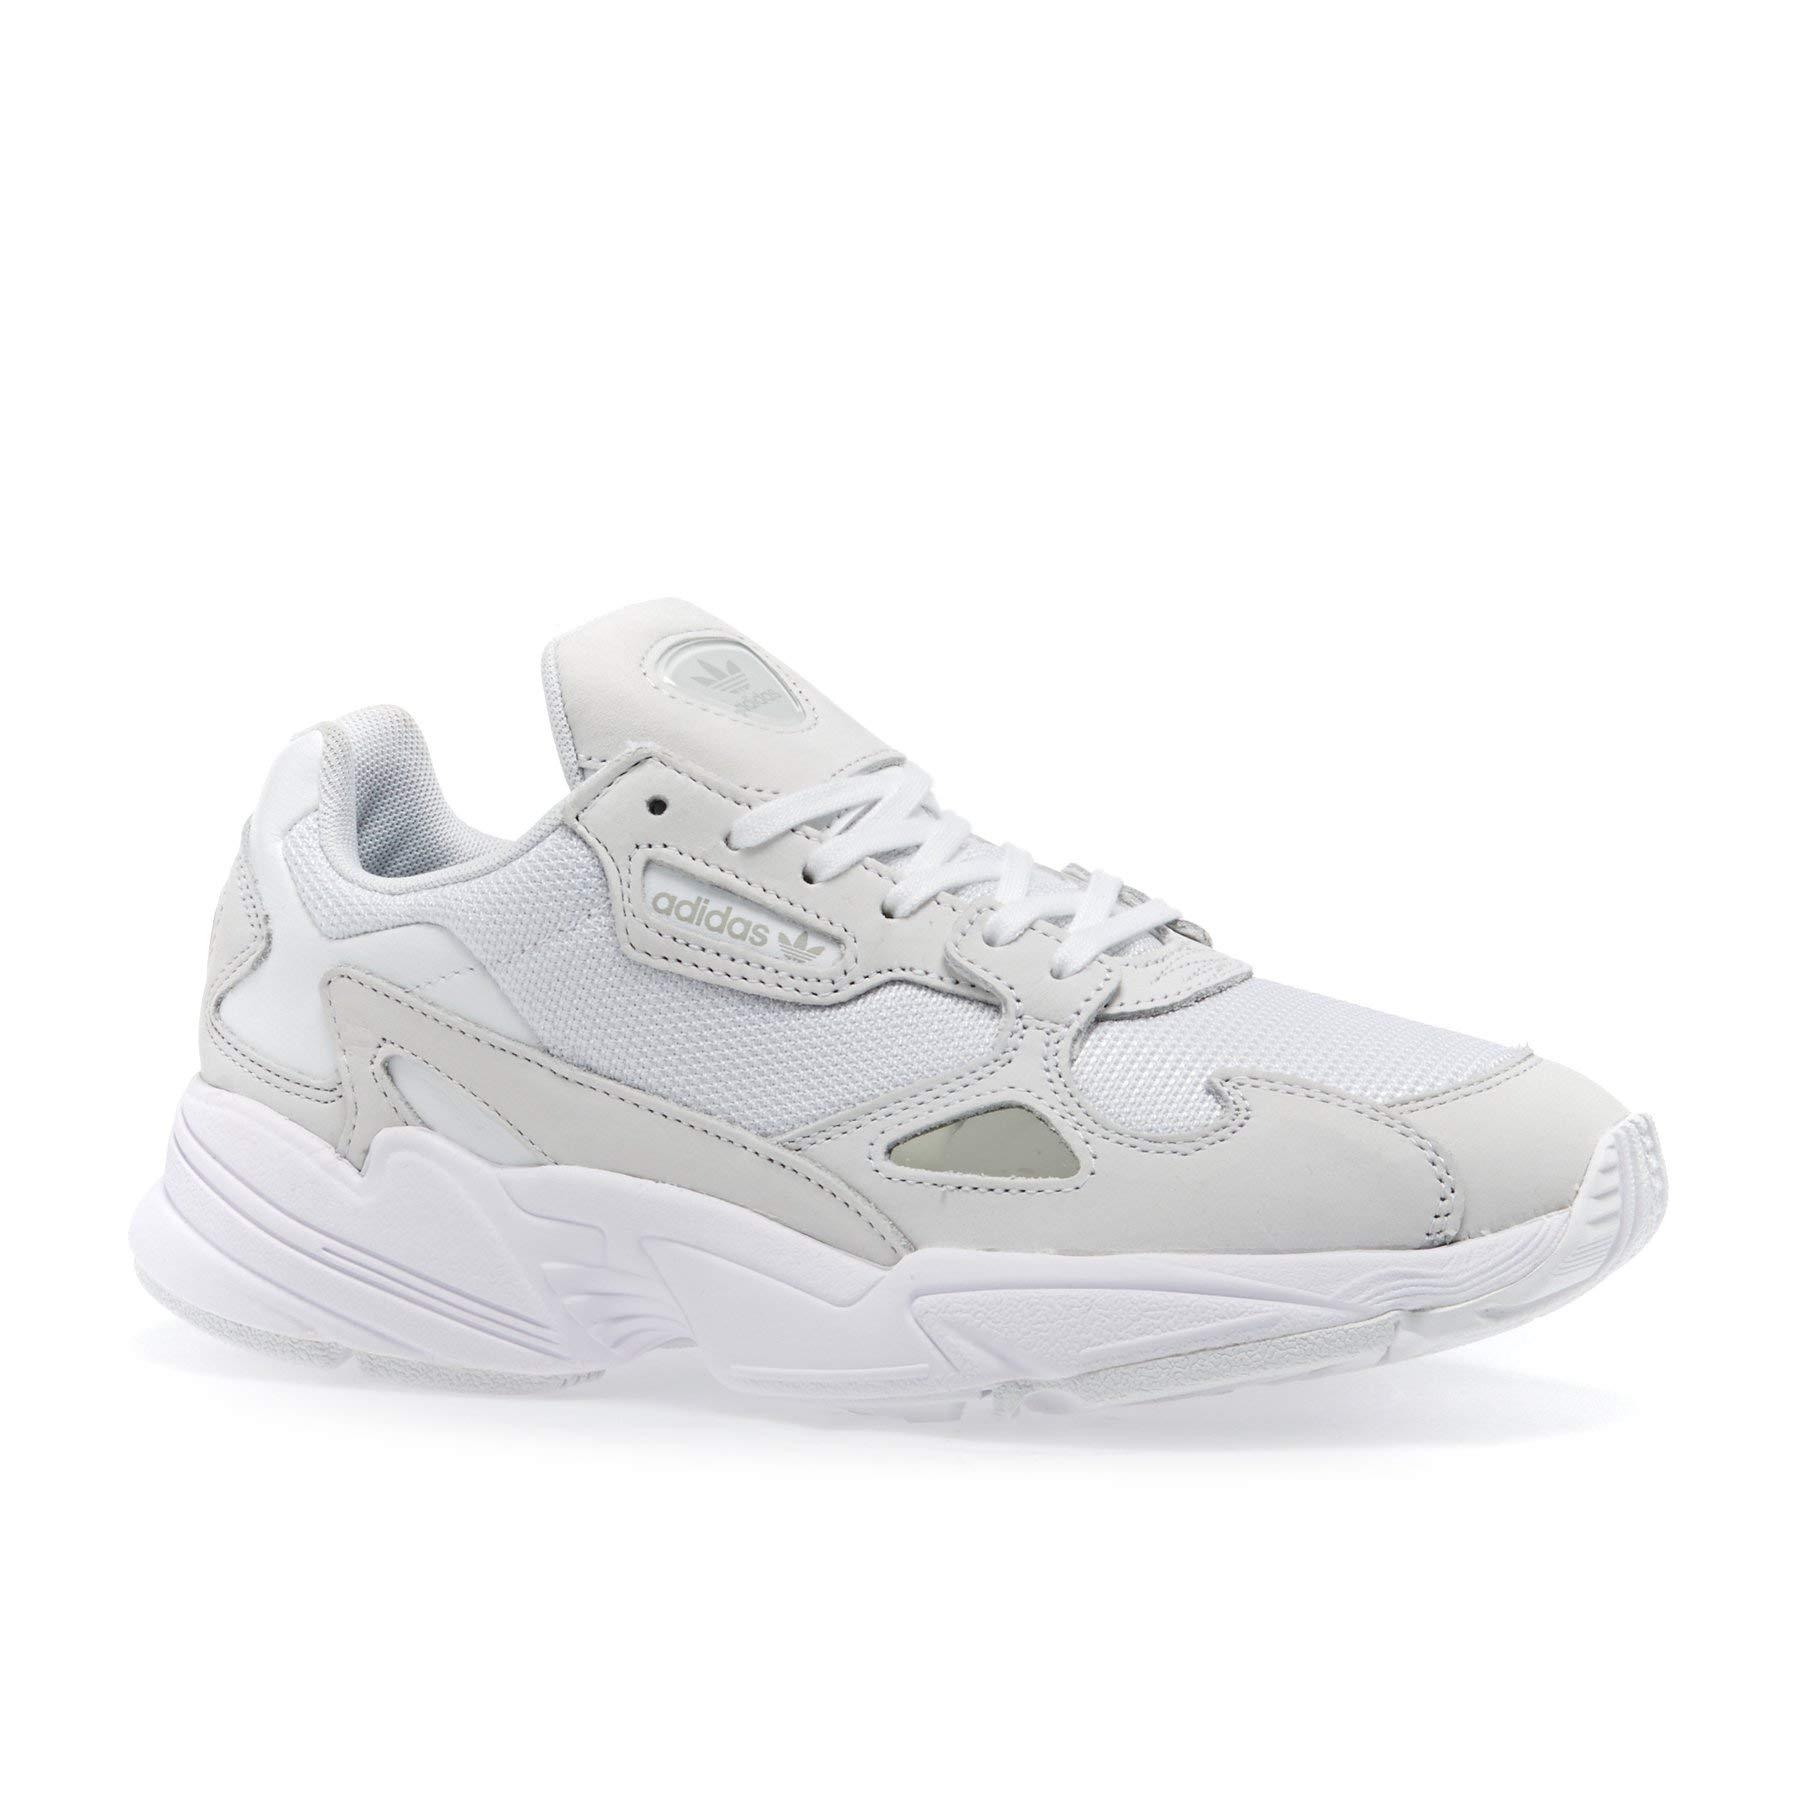 adidas Originals Falcon Womens Shoes 9.5 B(M) US Women / 8.5 D(M) US FTWR White FTWR White Crystal White